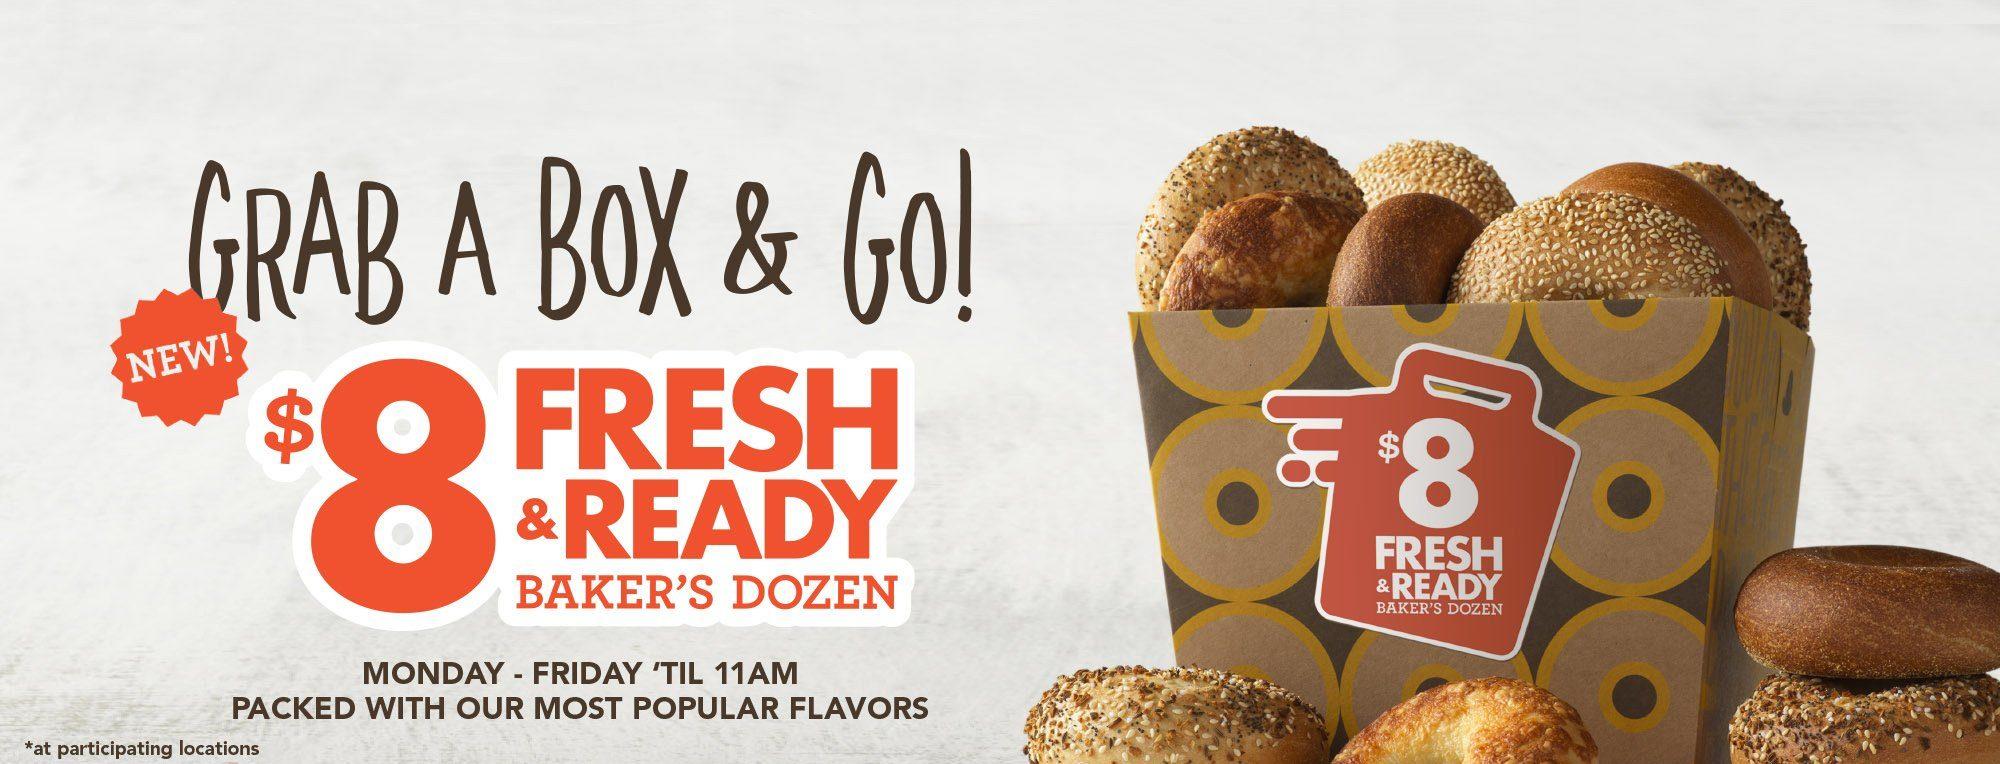 Grab a box & go! $8 Baker's Dozen